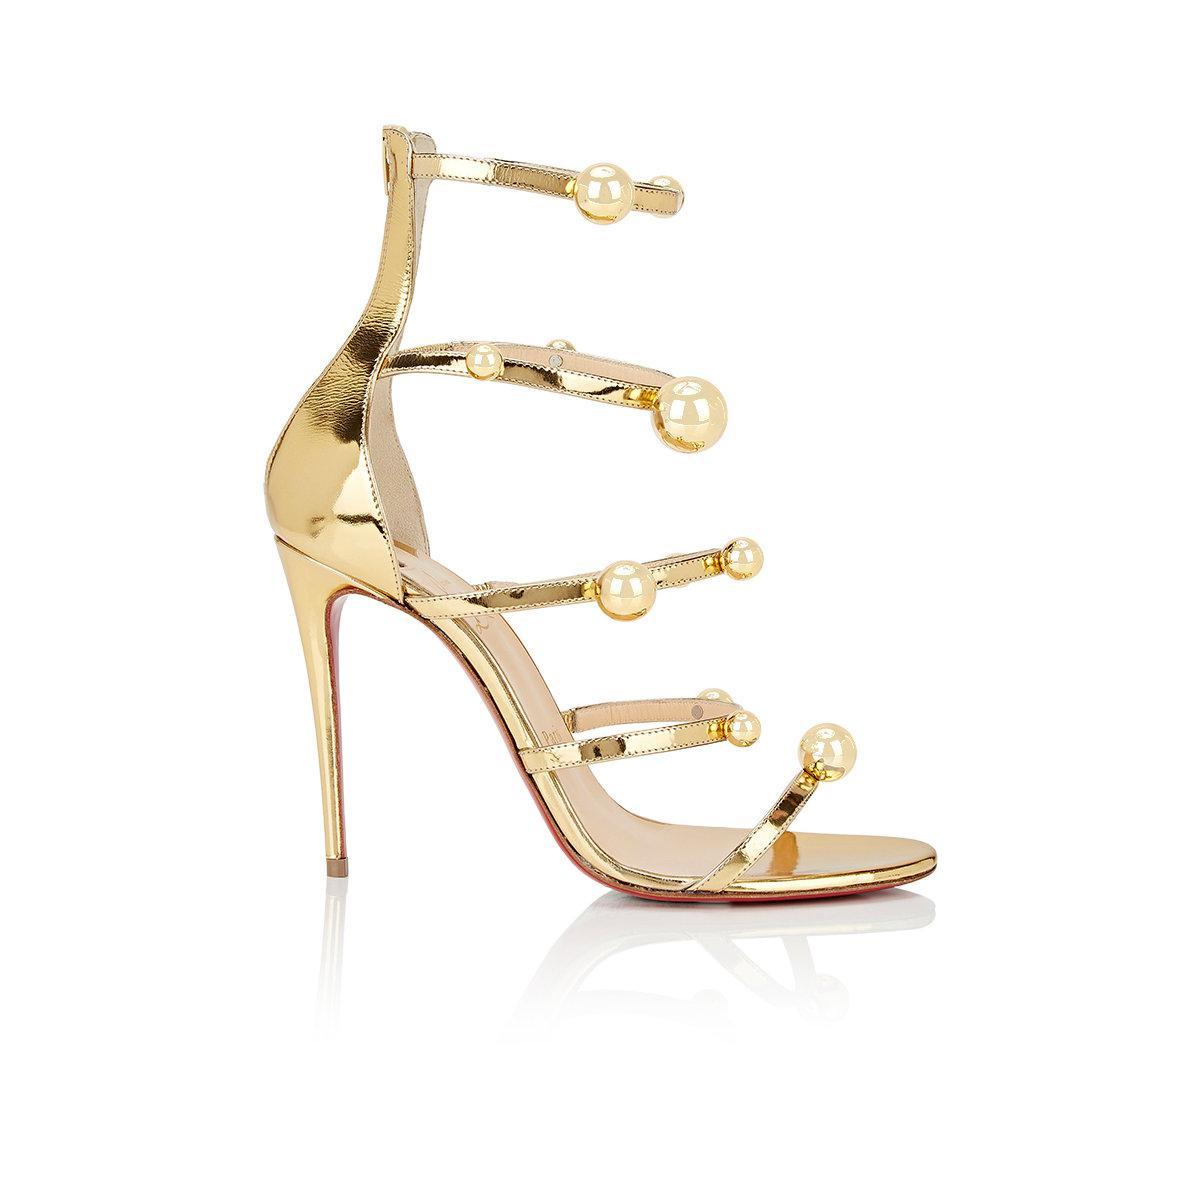 09577dc8492f Christian Louboutin Atonana Specchio Leather Sandals in Metallic - Lyst